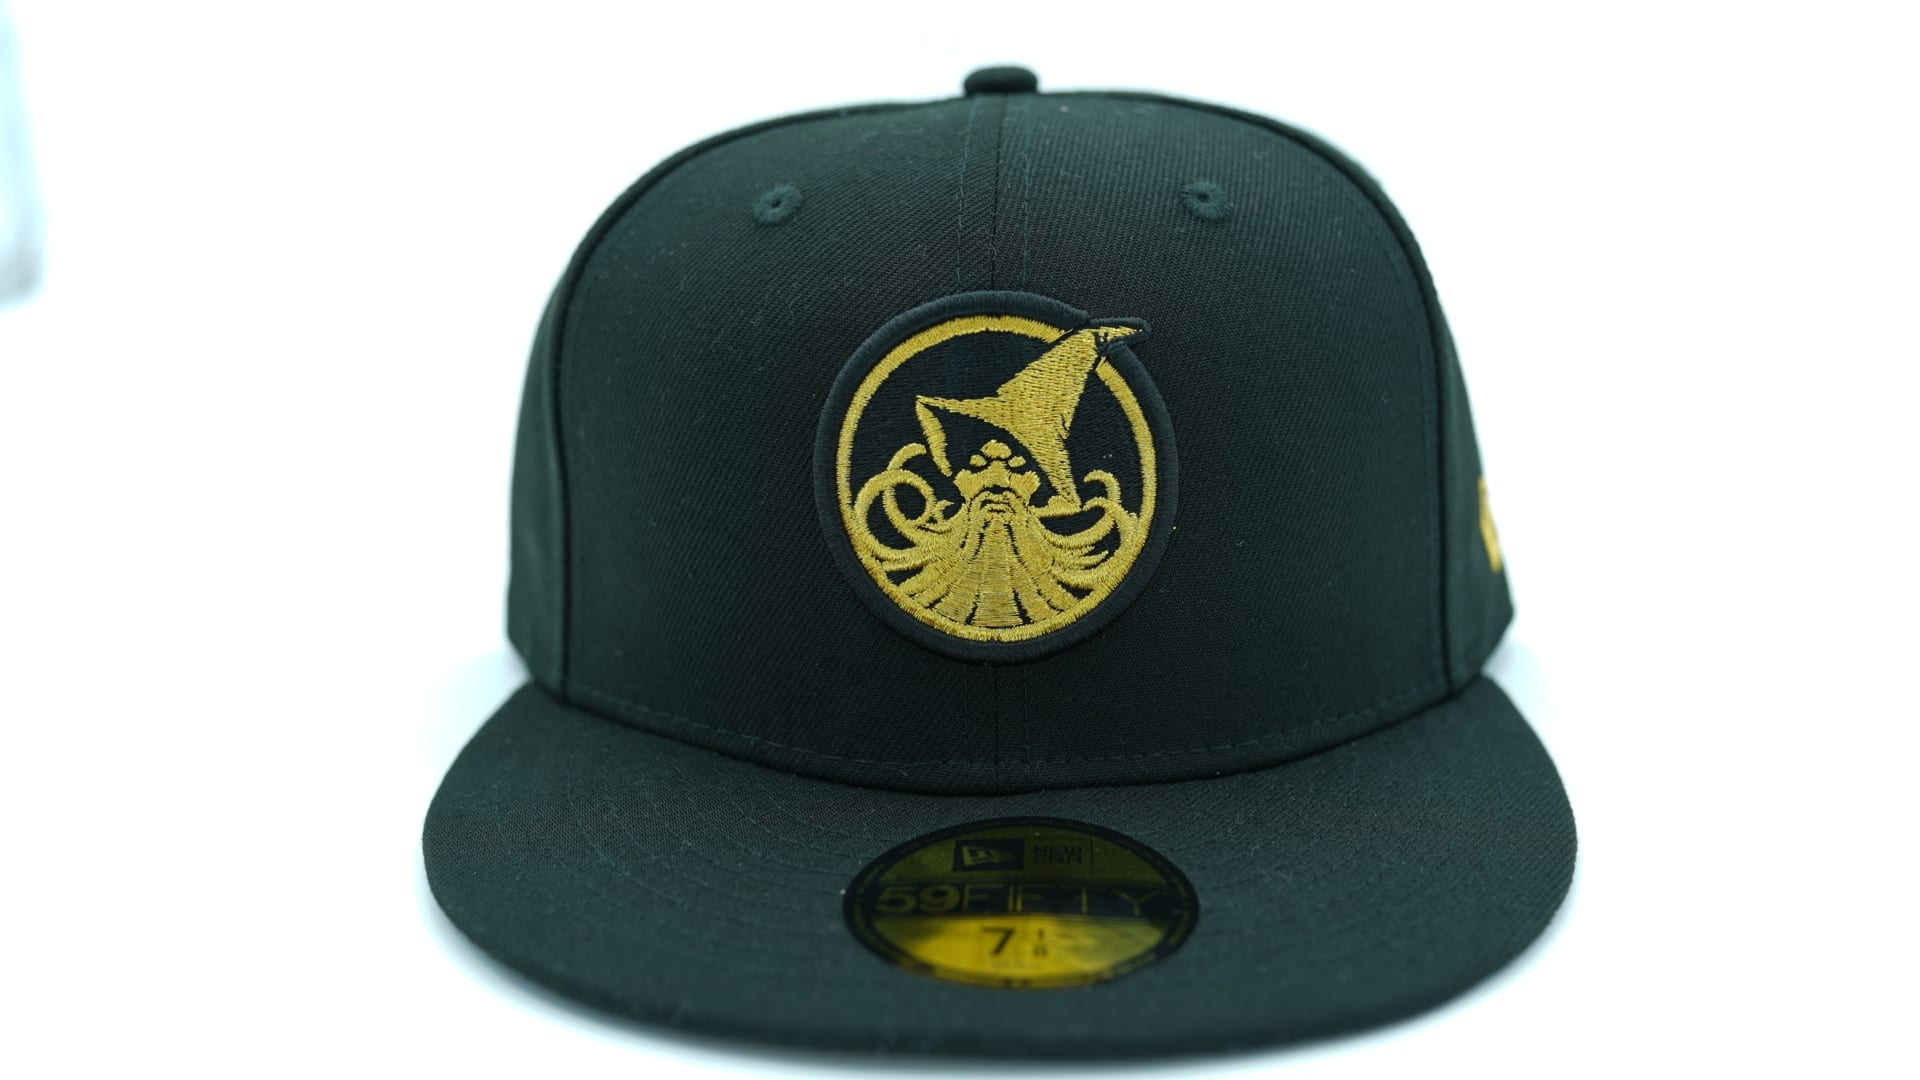 439a5abb505 New England Patriots Super Bowl LI Bound Swoosh Flex Classic 99 Fitted Hat  by NIKE x